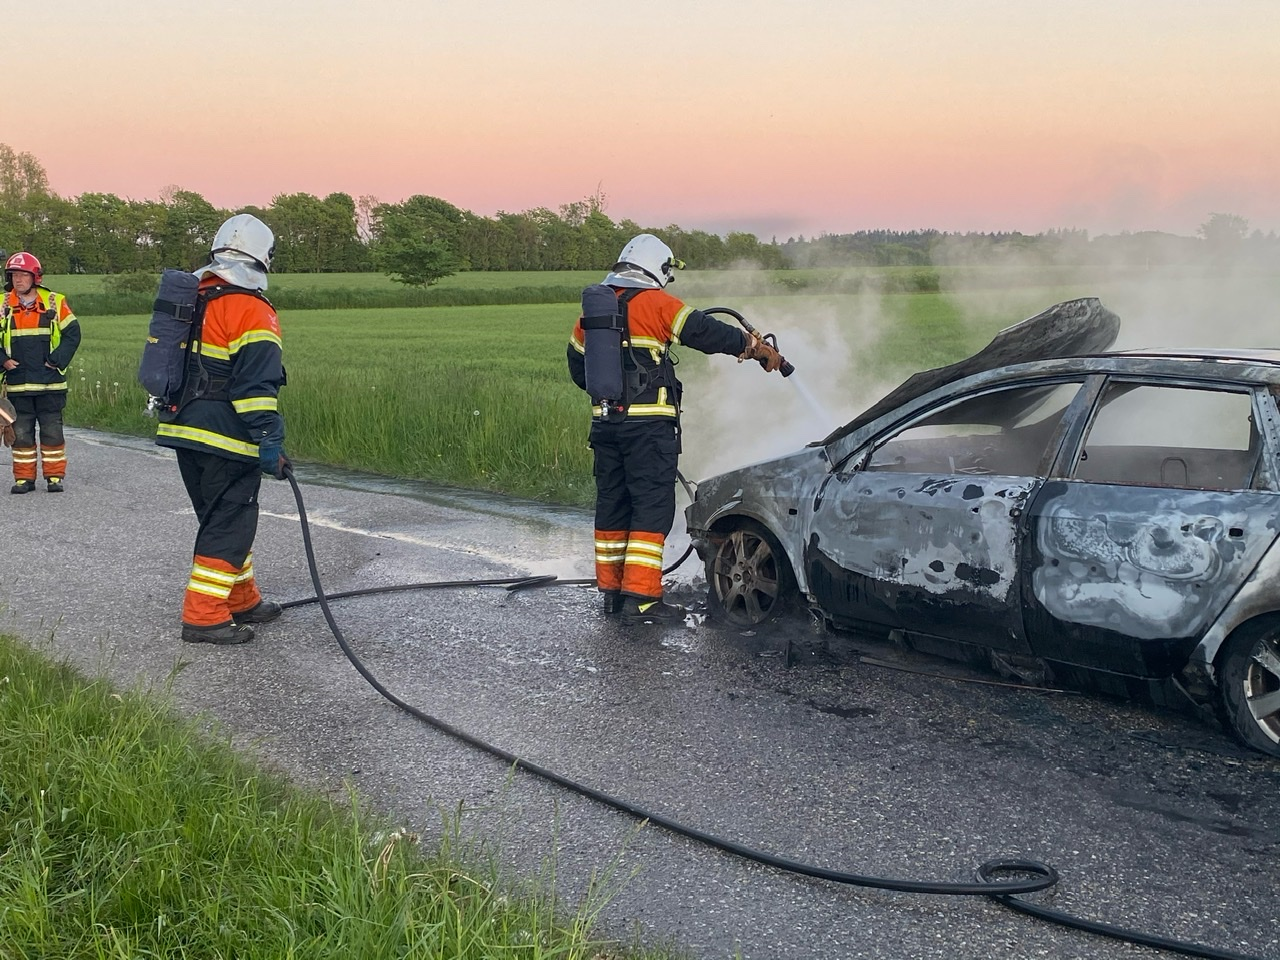 Bil brød i brand under kørsel - ild i bil i Sæby